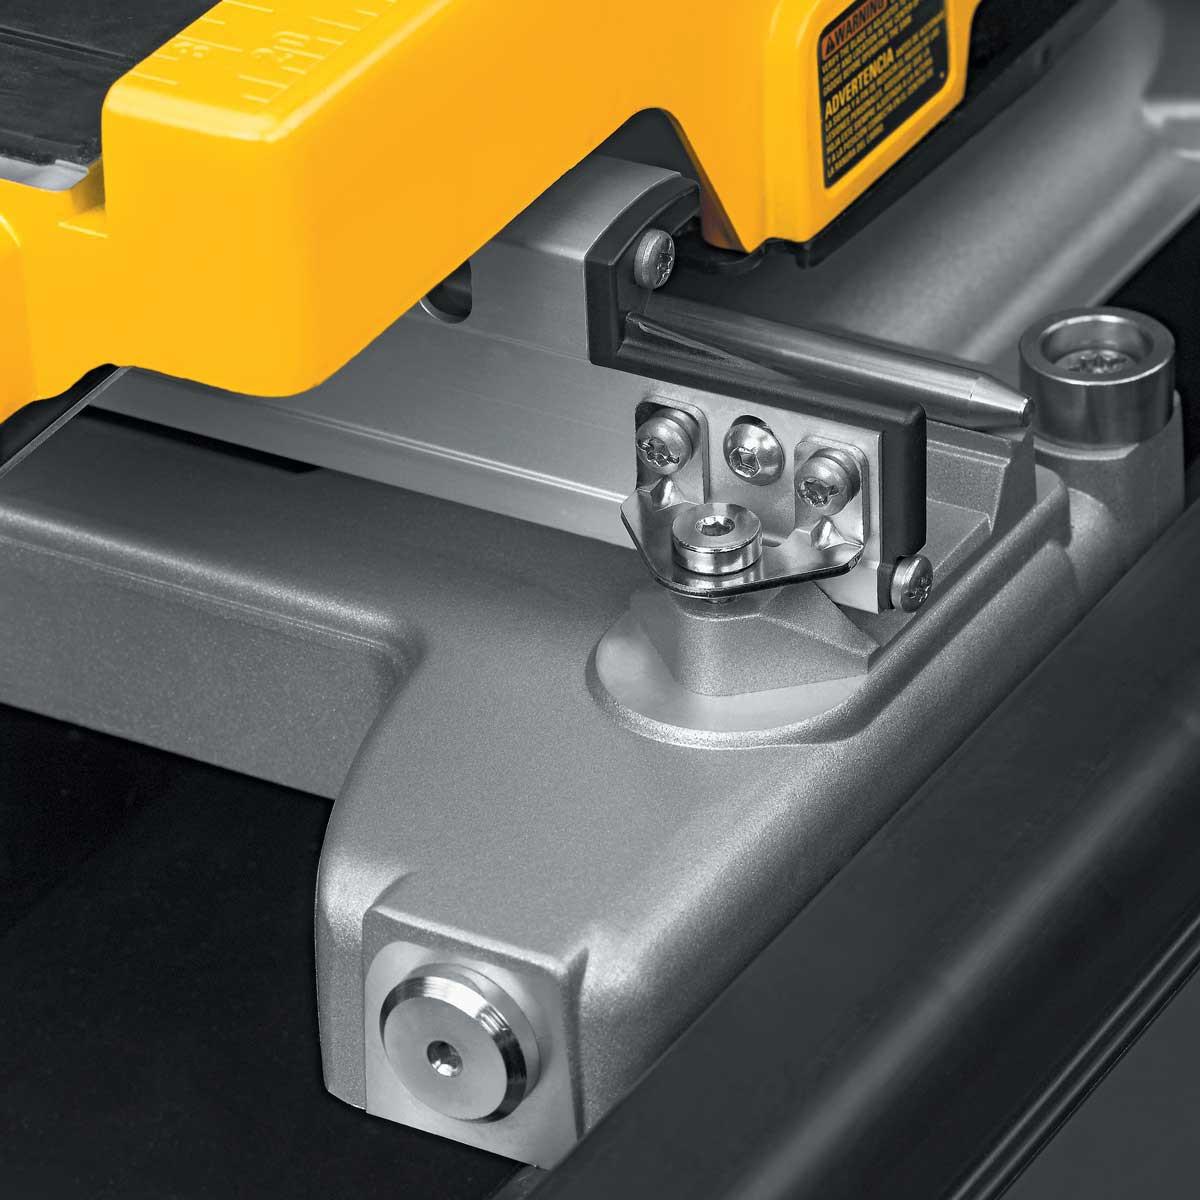 Dewalt D24000 adjustable cutting rails